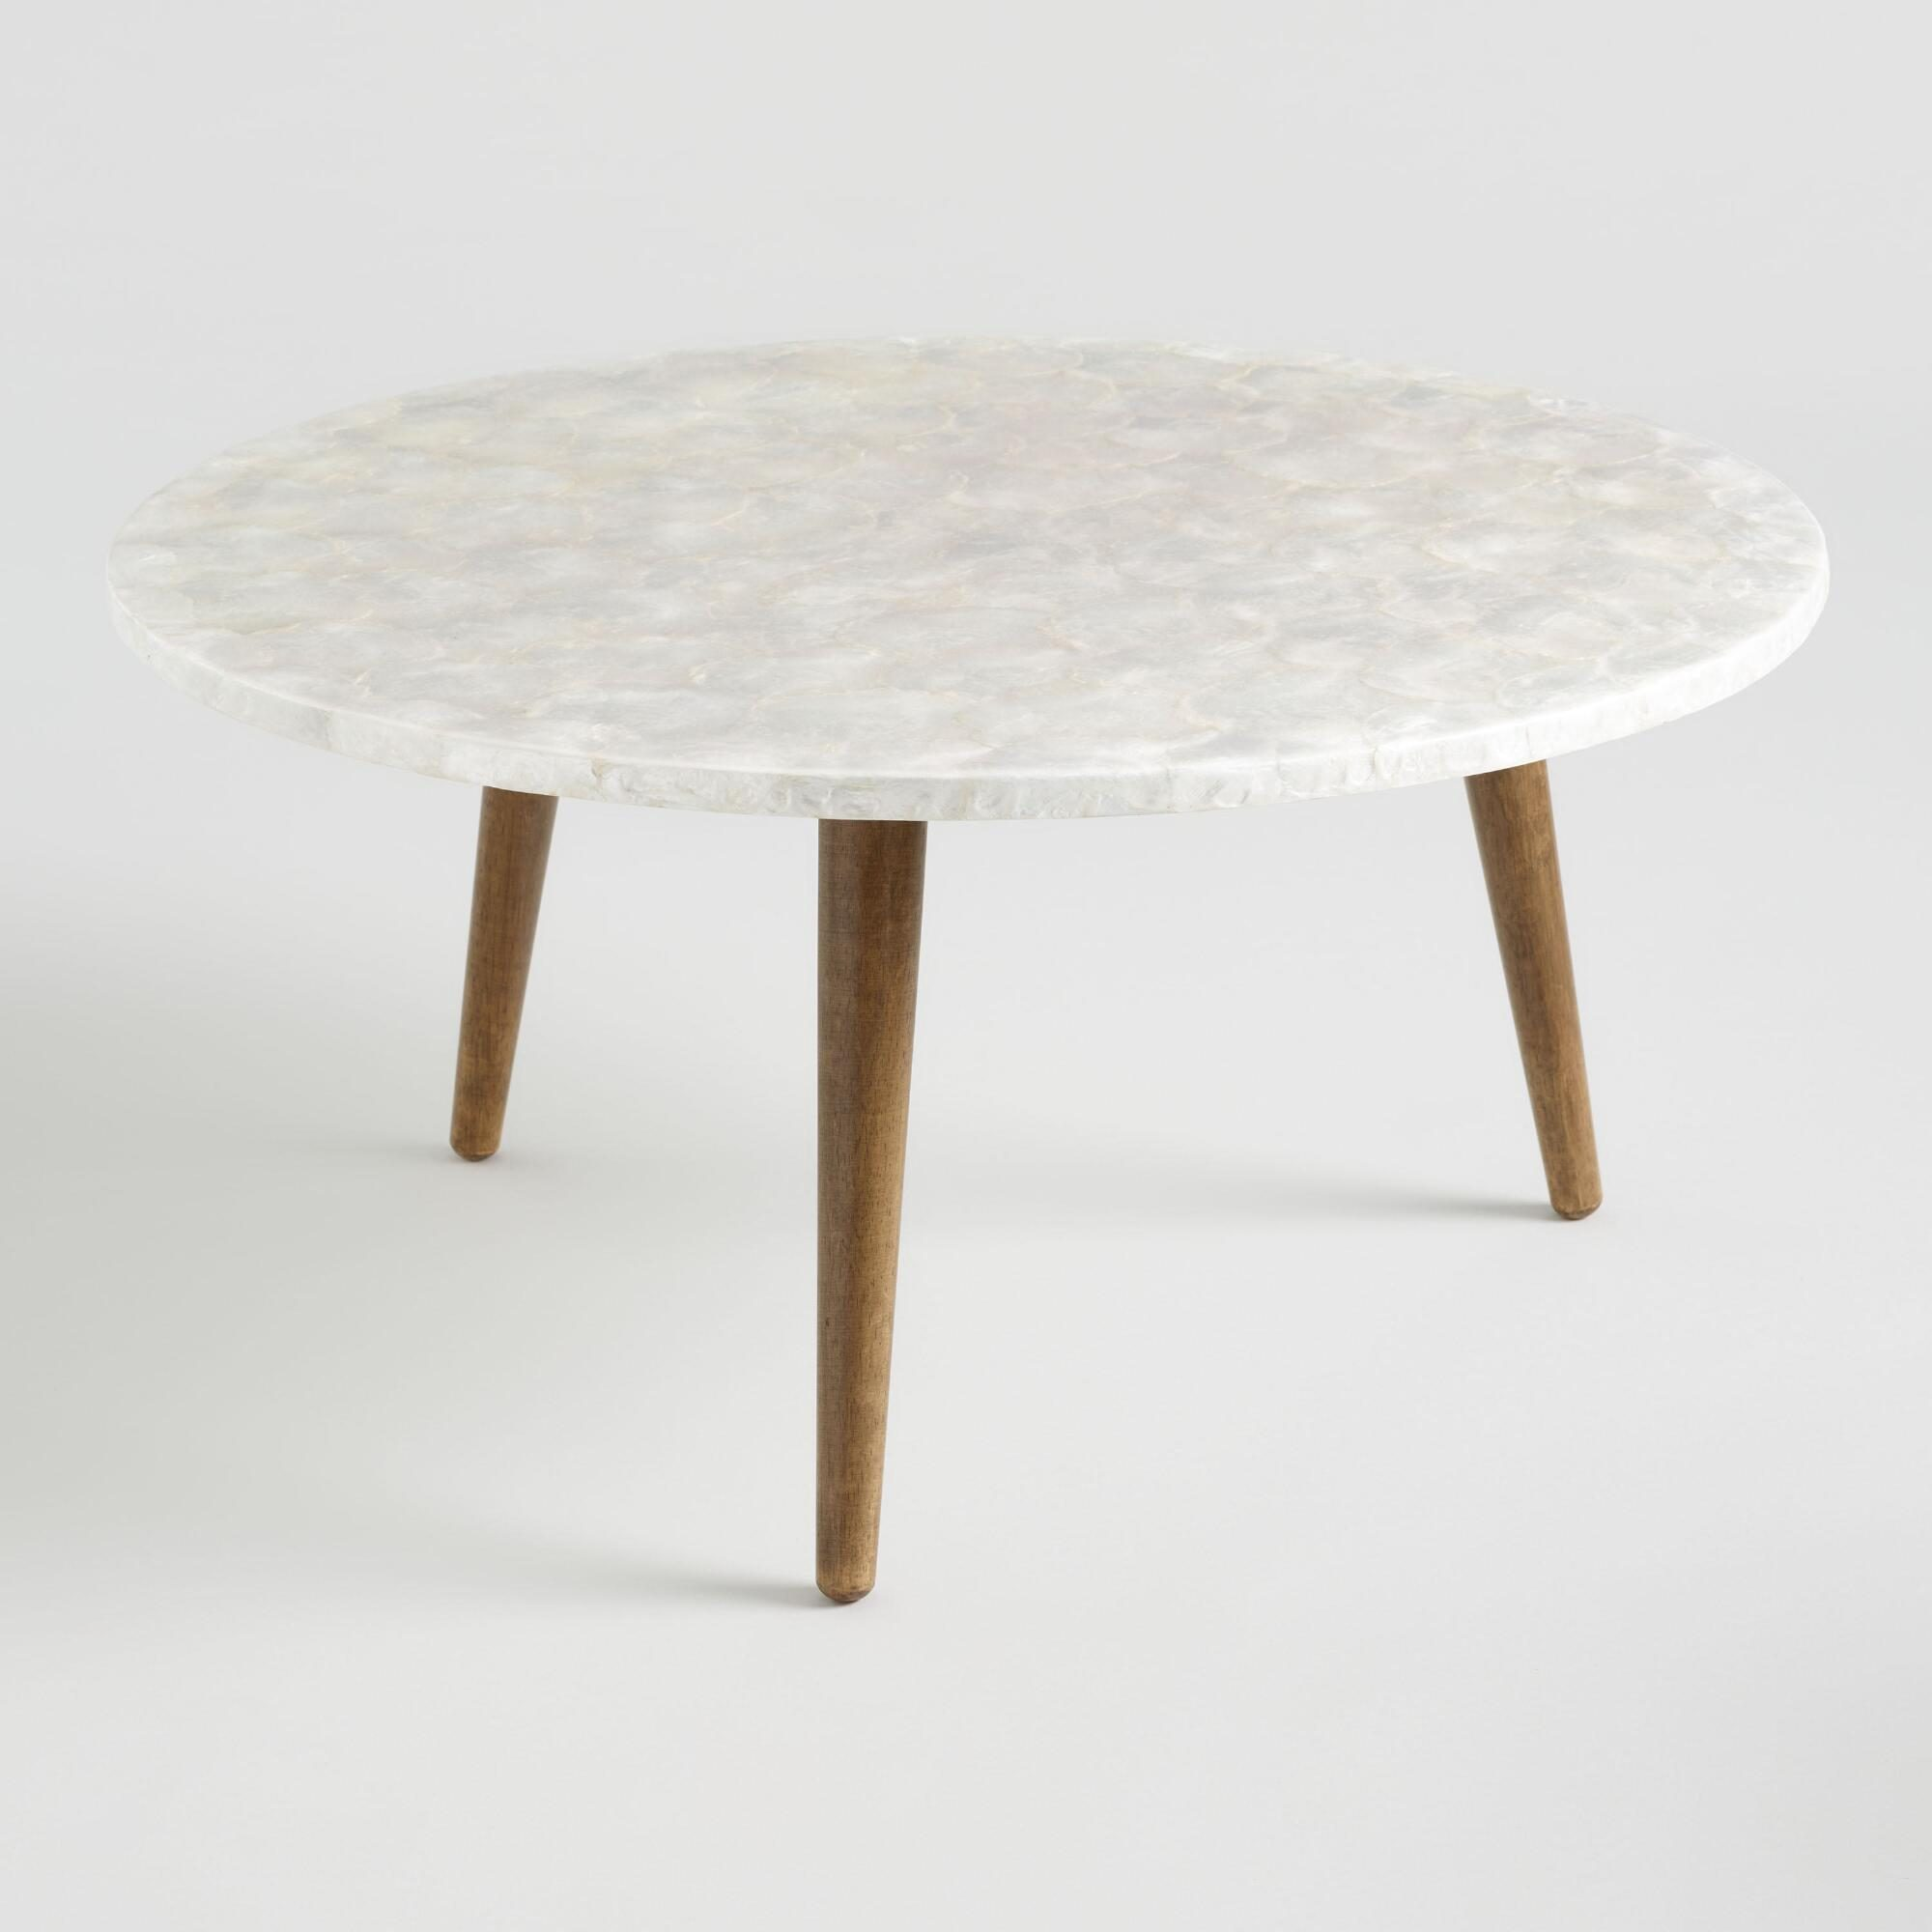 Round White Capiz Coffee Table - Natural Fiber by World Market